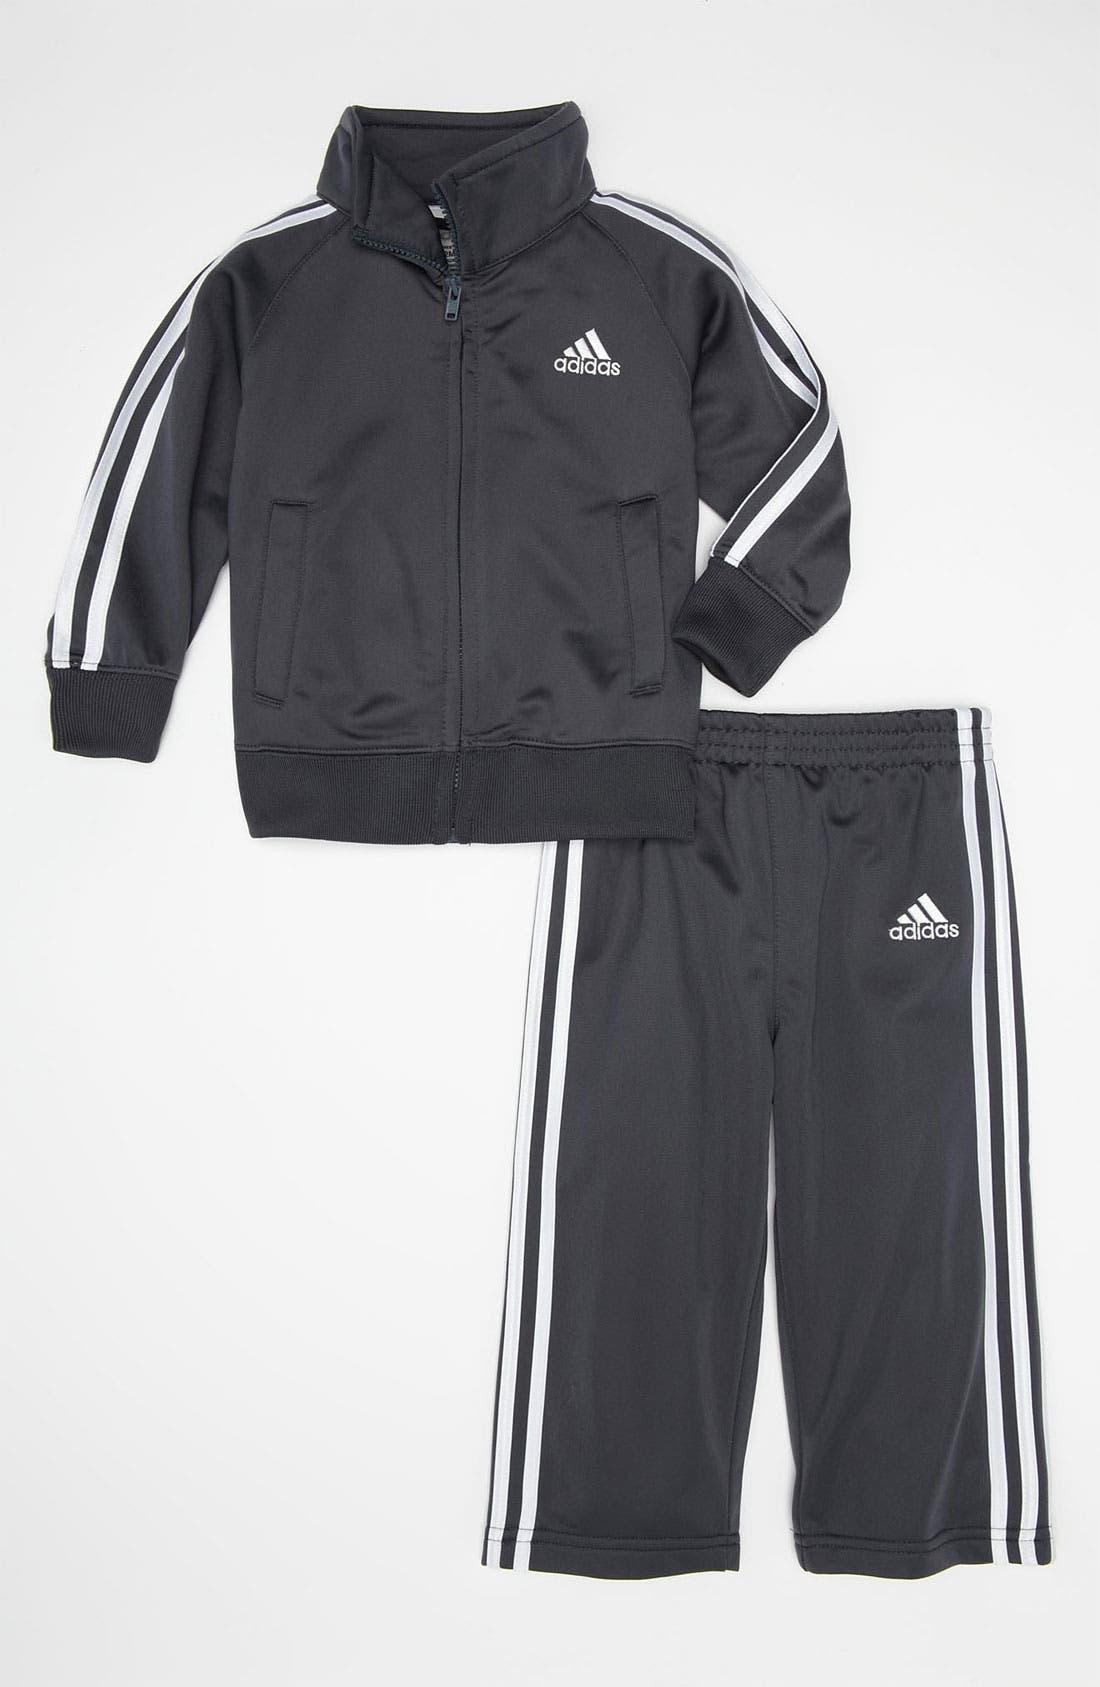 Alternate Image 1 Selected - adidas Tricot Jacket & Pants Set (Toddler)